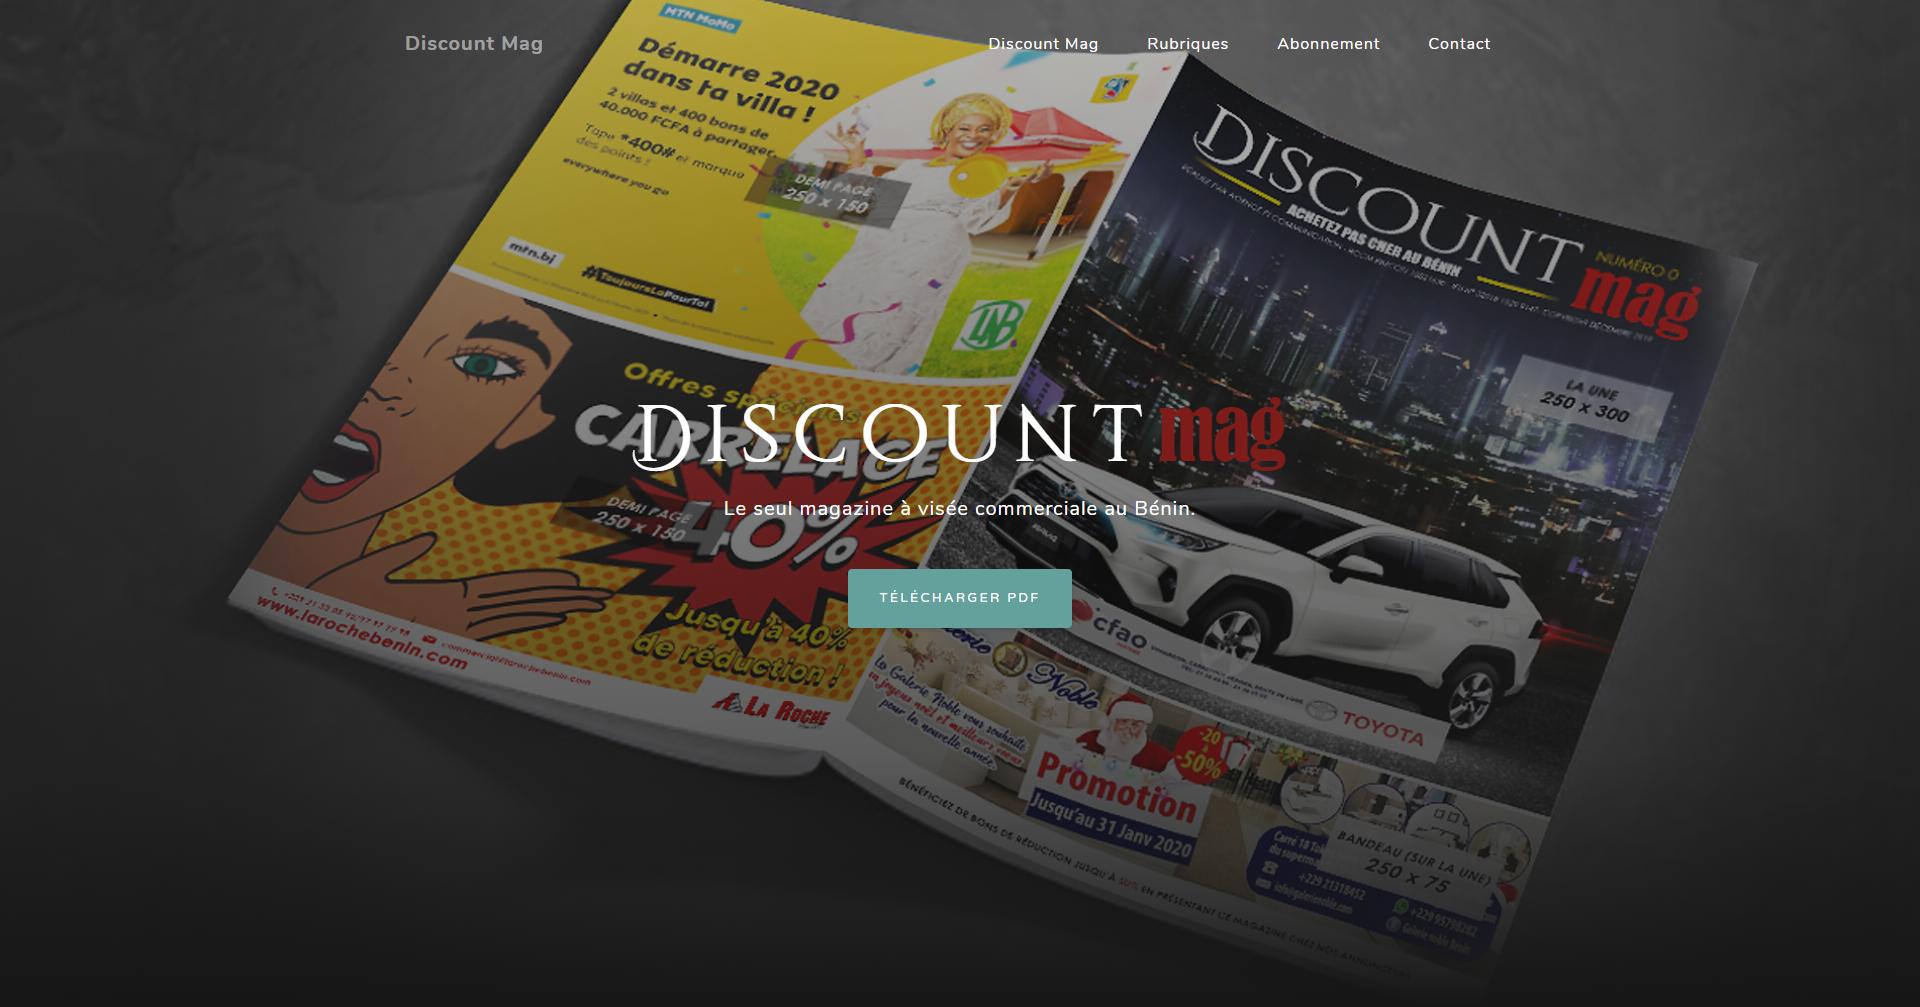 Discount Mag